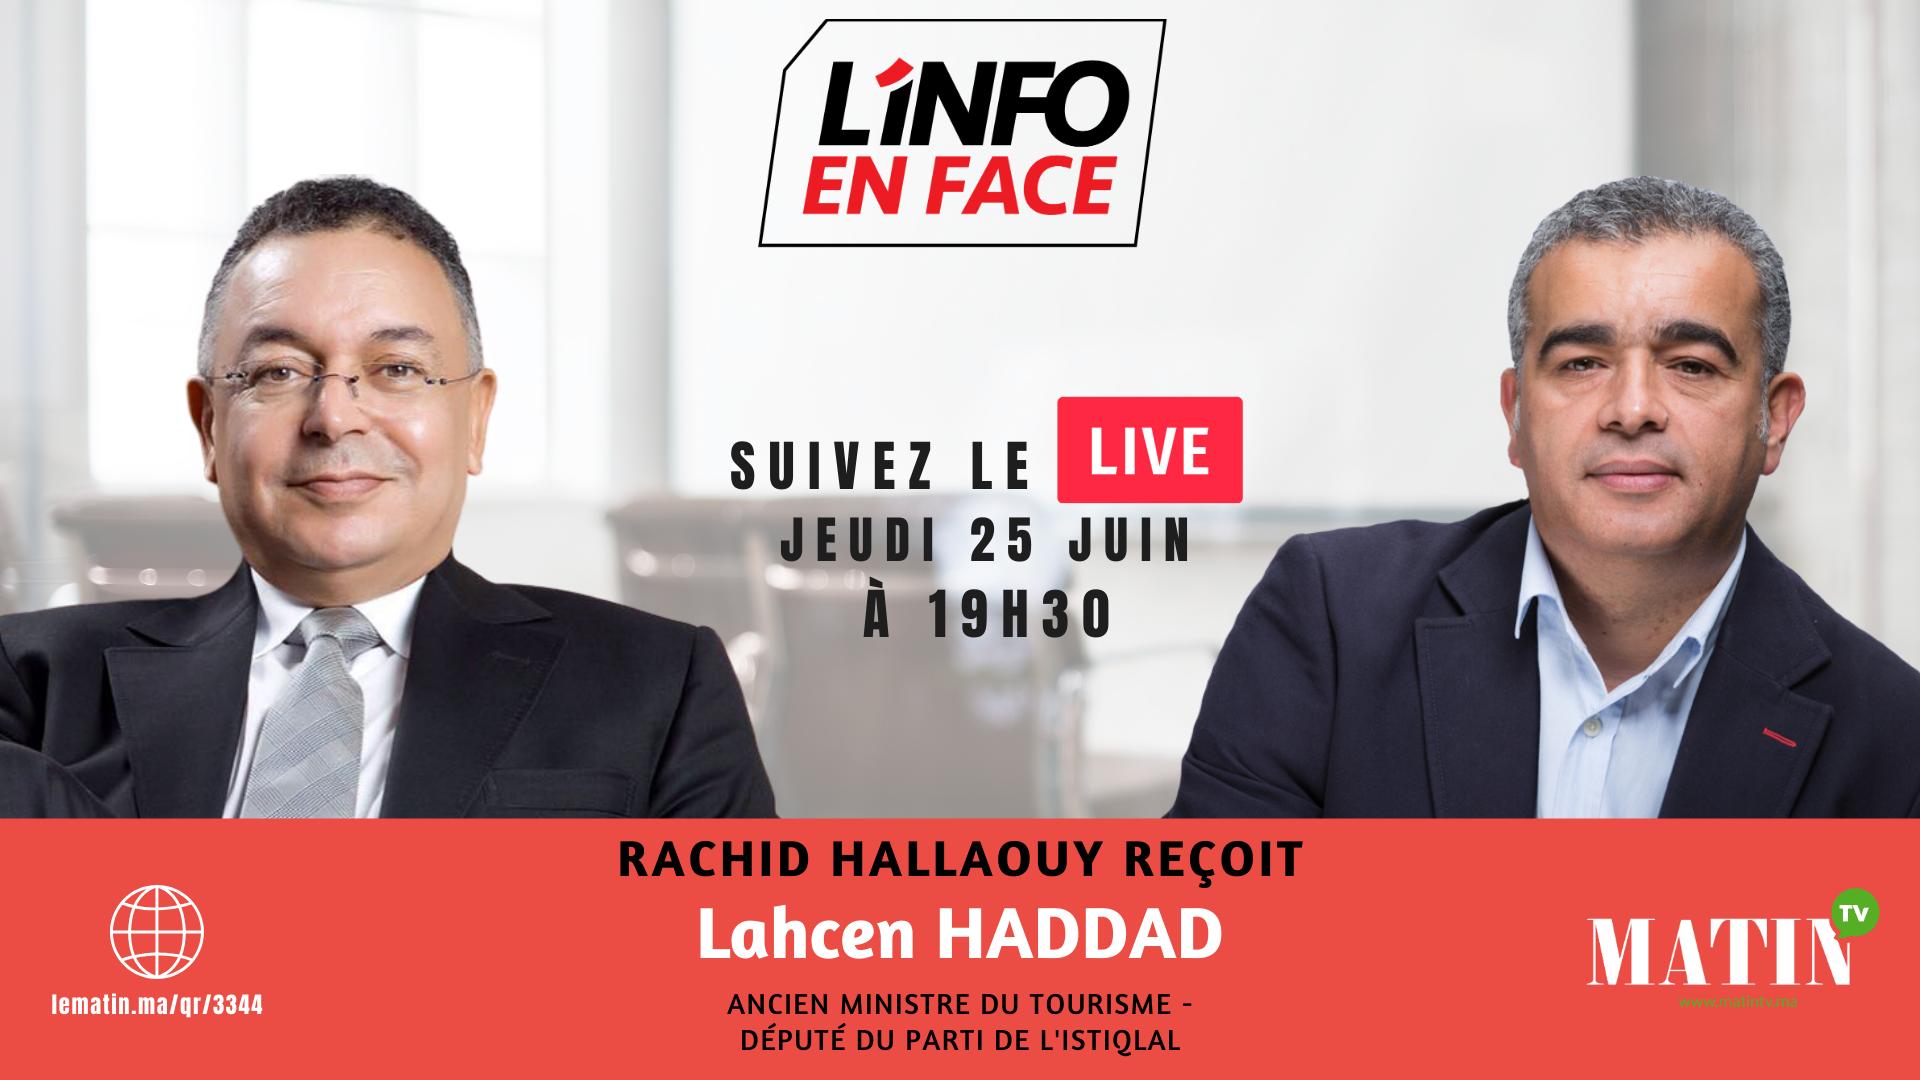 Live : L'Info en Face avec Lahcen Haddad